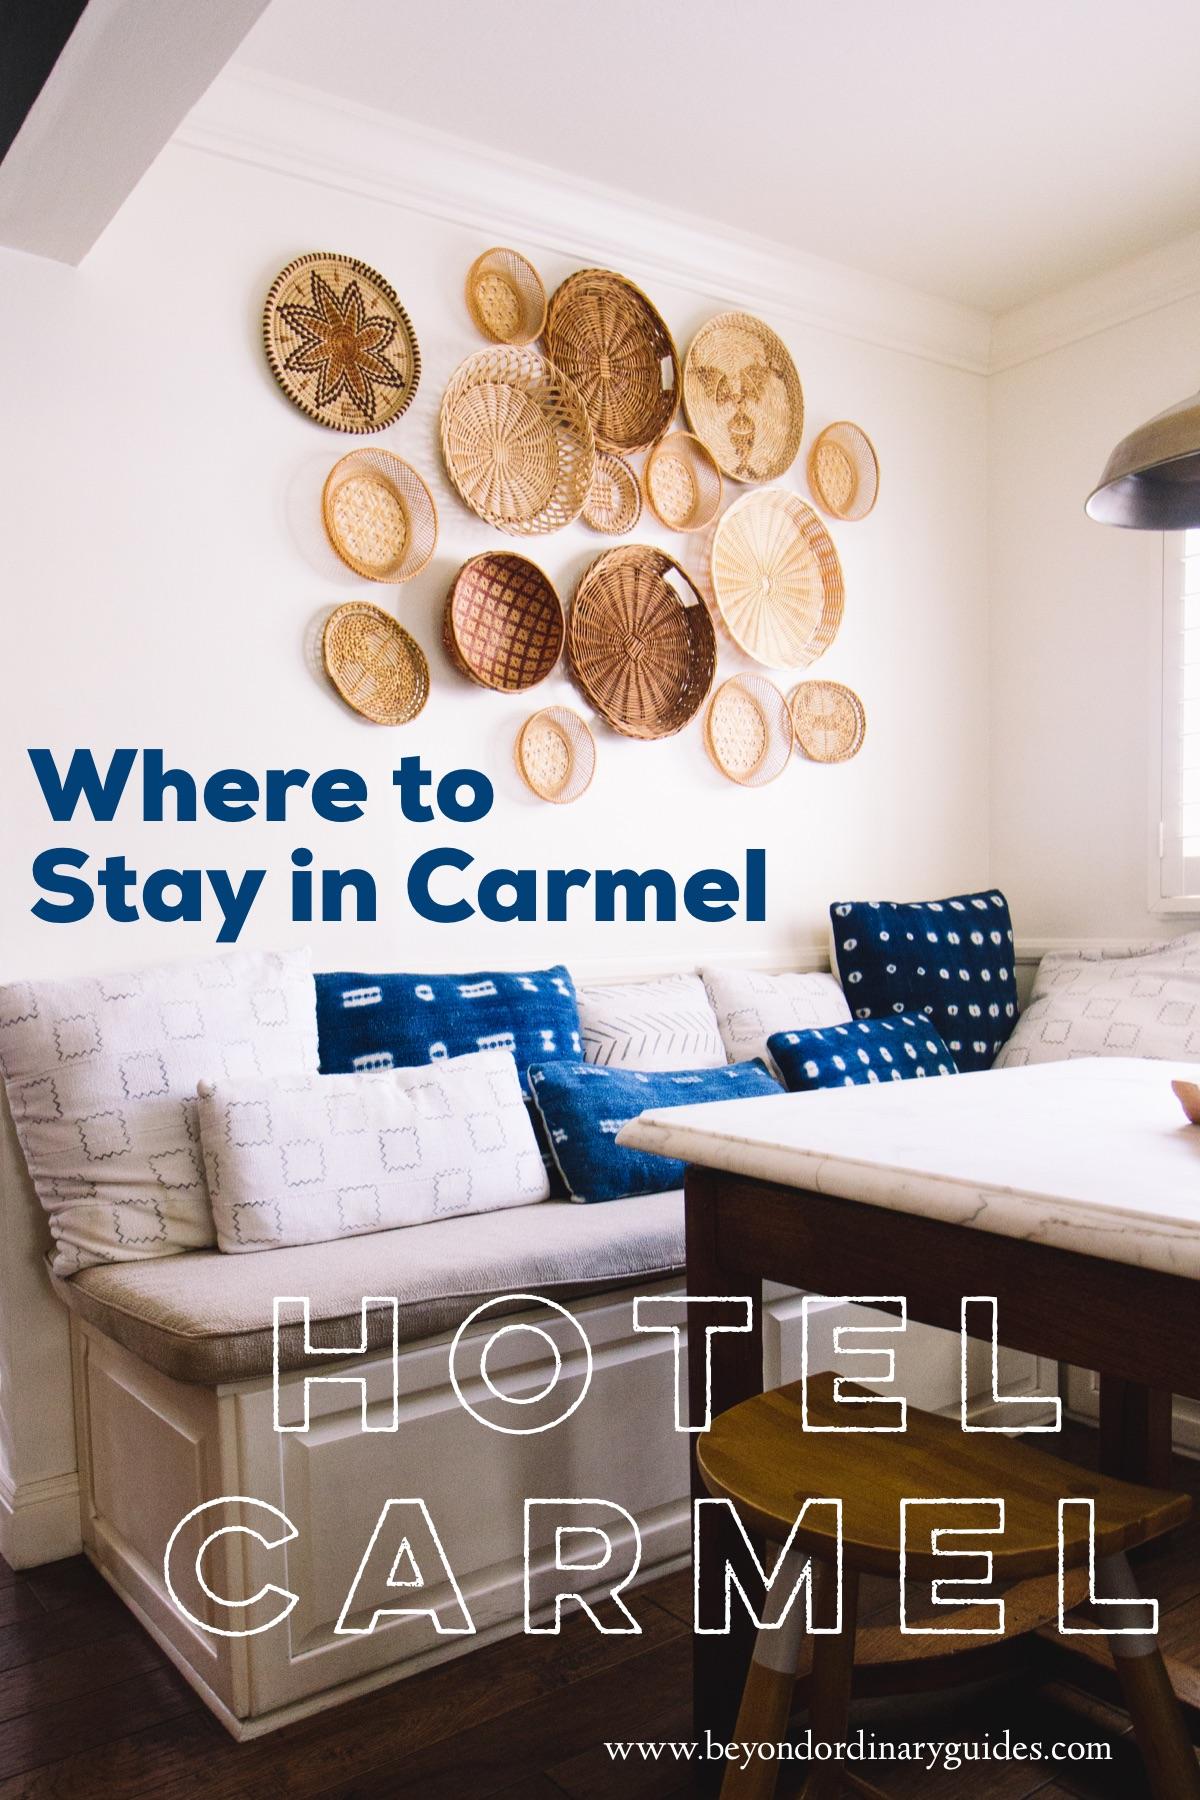 Where to Stay in Carmel | Hotel Carmel.jpg